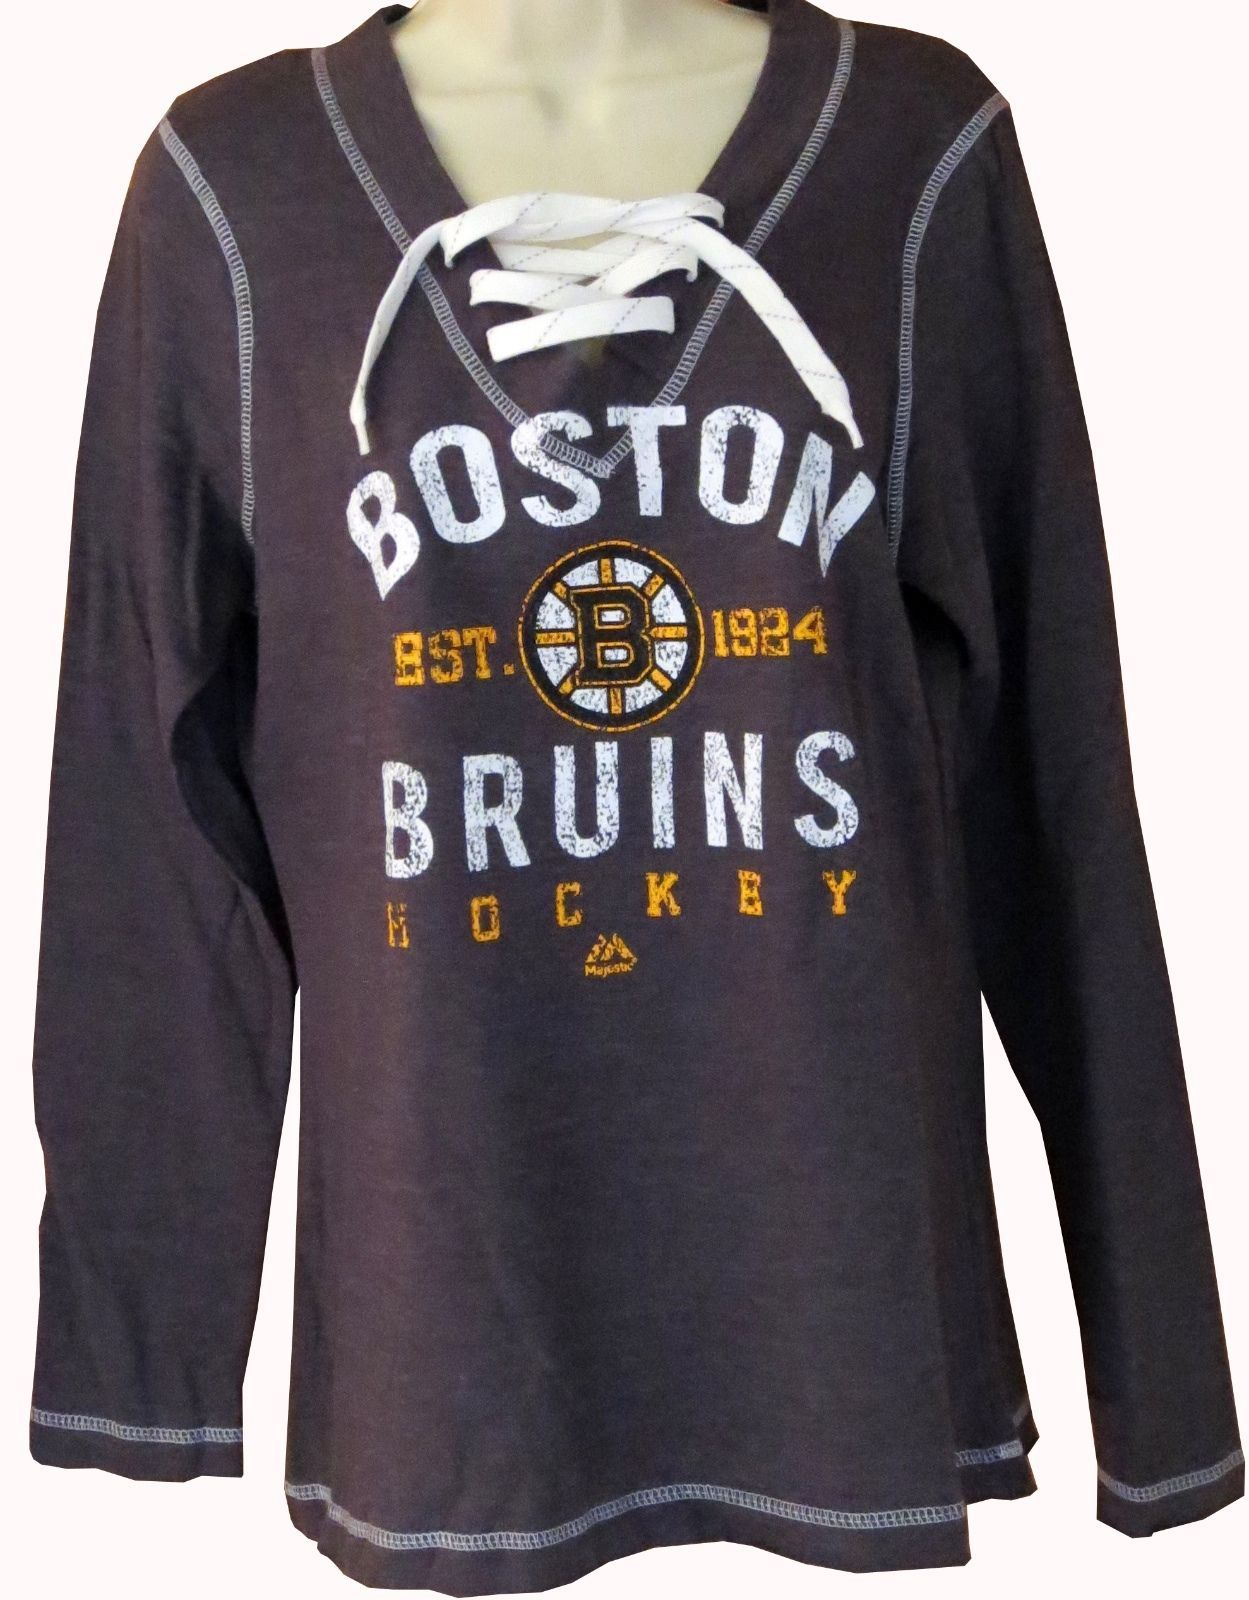 28666cc1c82 Womens Bruins Shirts - Joe Maloy